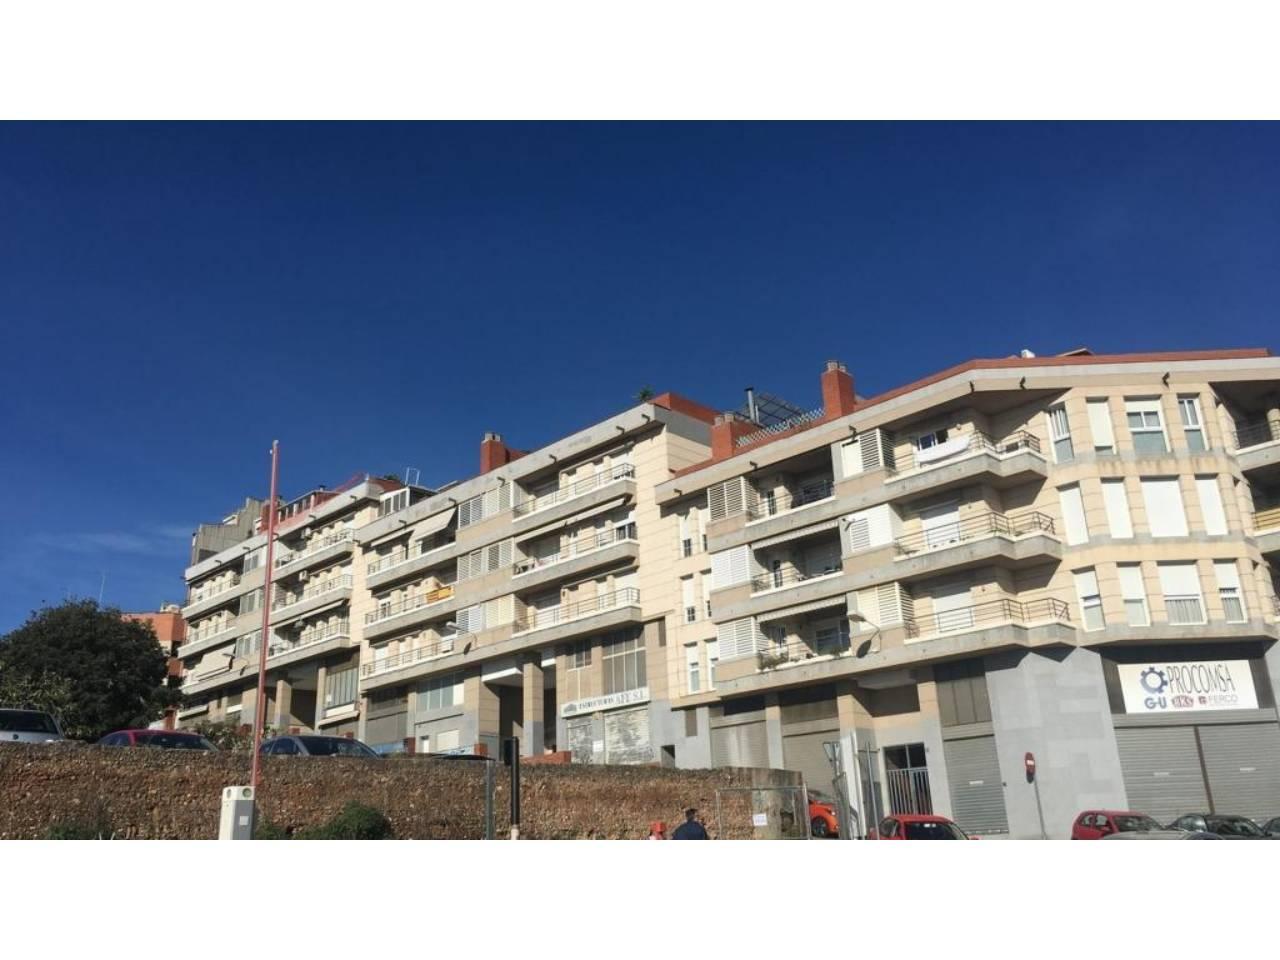 Pis en venda en Escola Industrial-Plaça de Catalunya